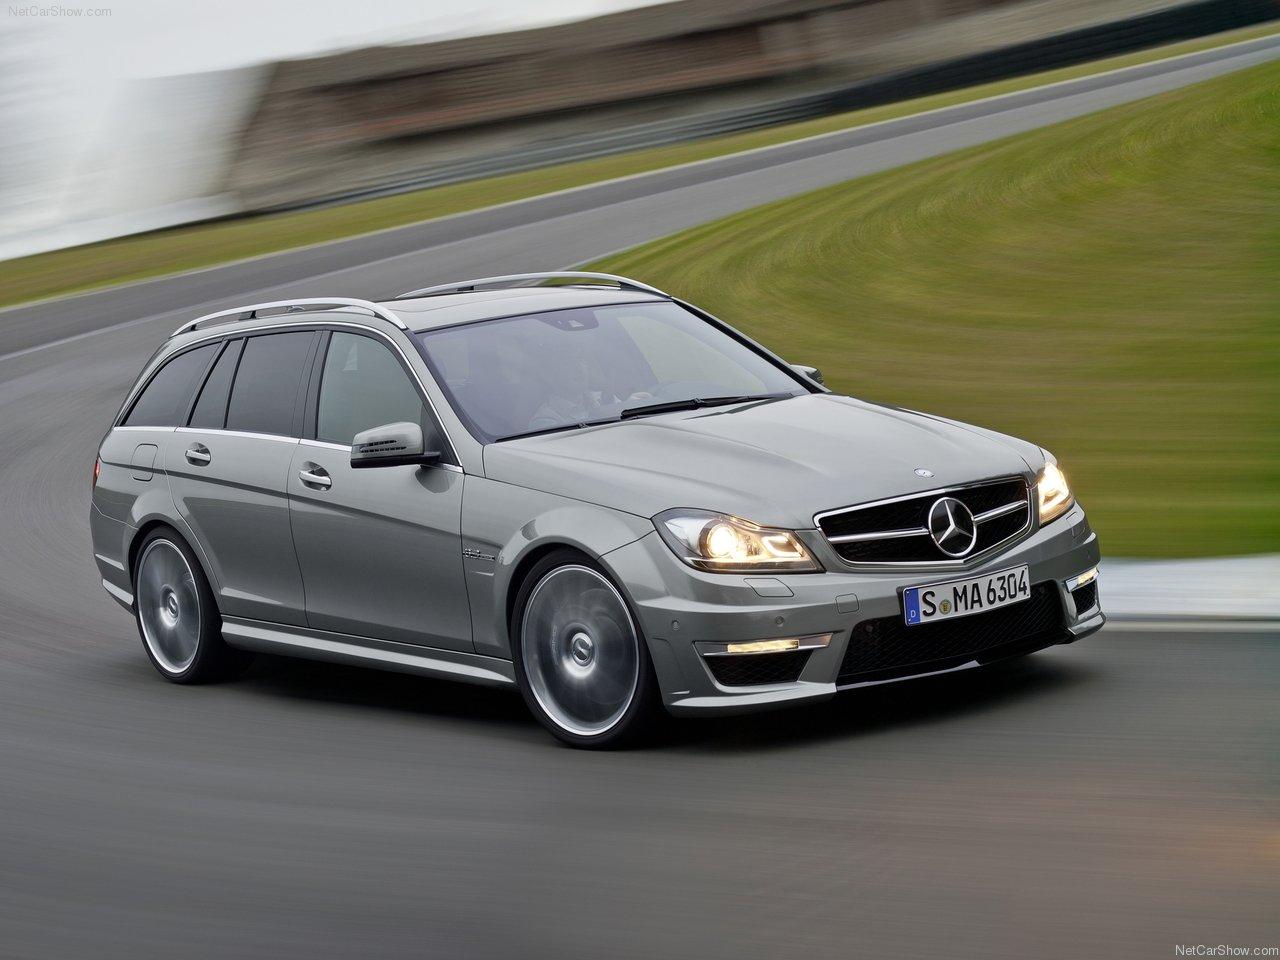 http://2.bp.blogspot.com/_xhqjRo6NERQ/TVFgulO4RWI/AAAAAAAAKJ4/wcQO3S9berY/s1600/Mercedes-Benz-C63_AMG_Estate_2012_1280x960_wallpaper_01.jpg